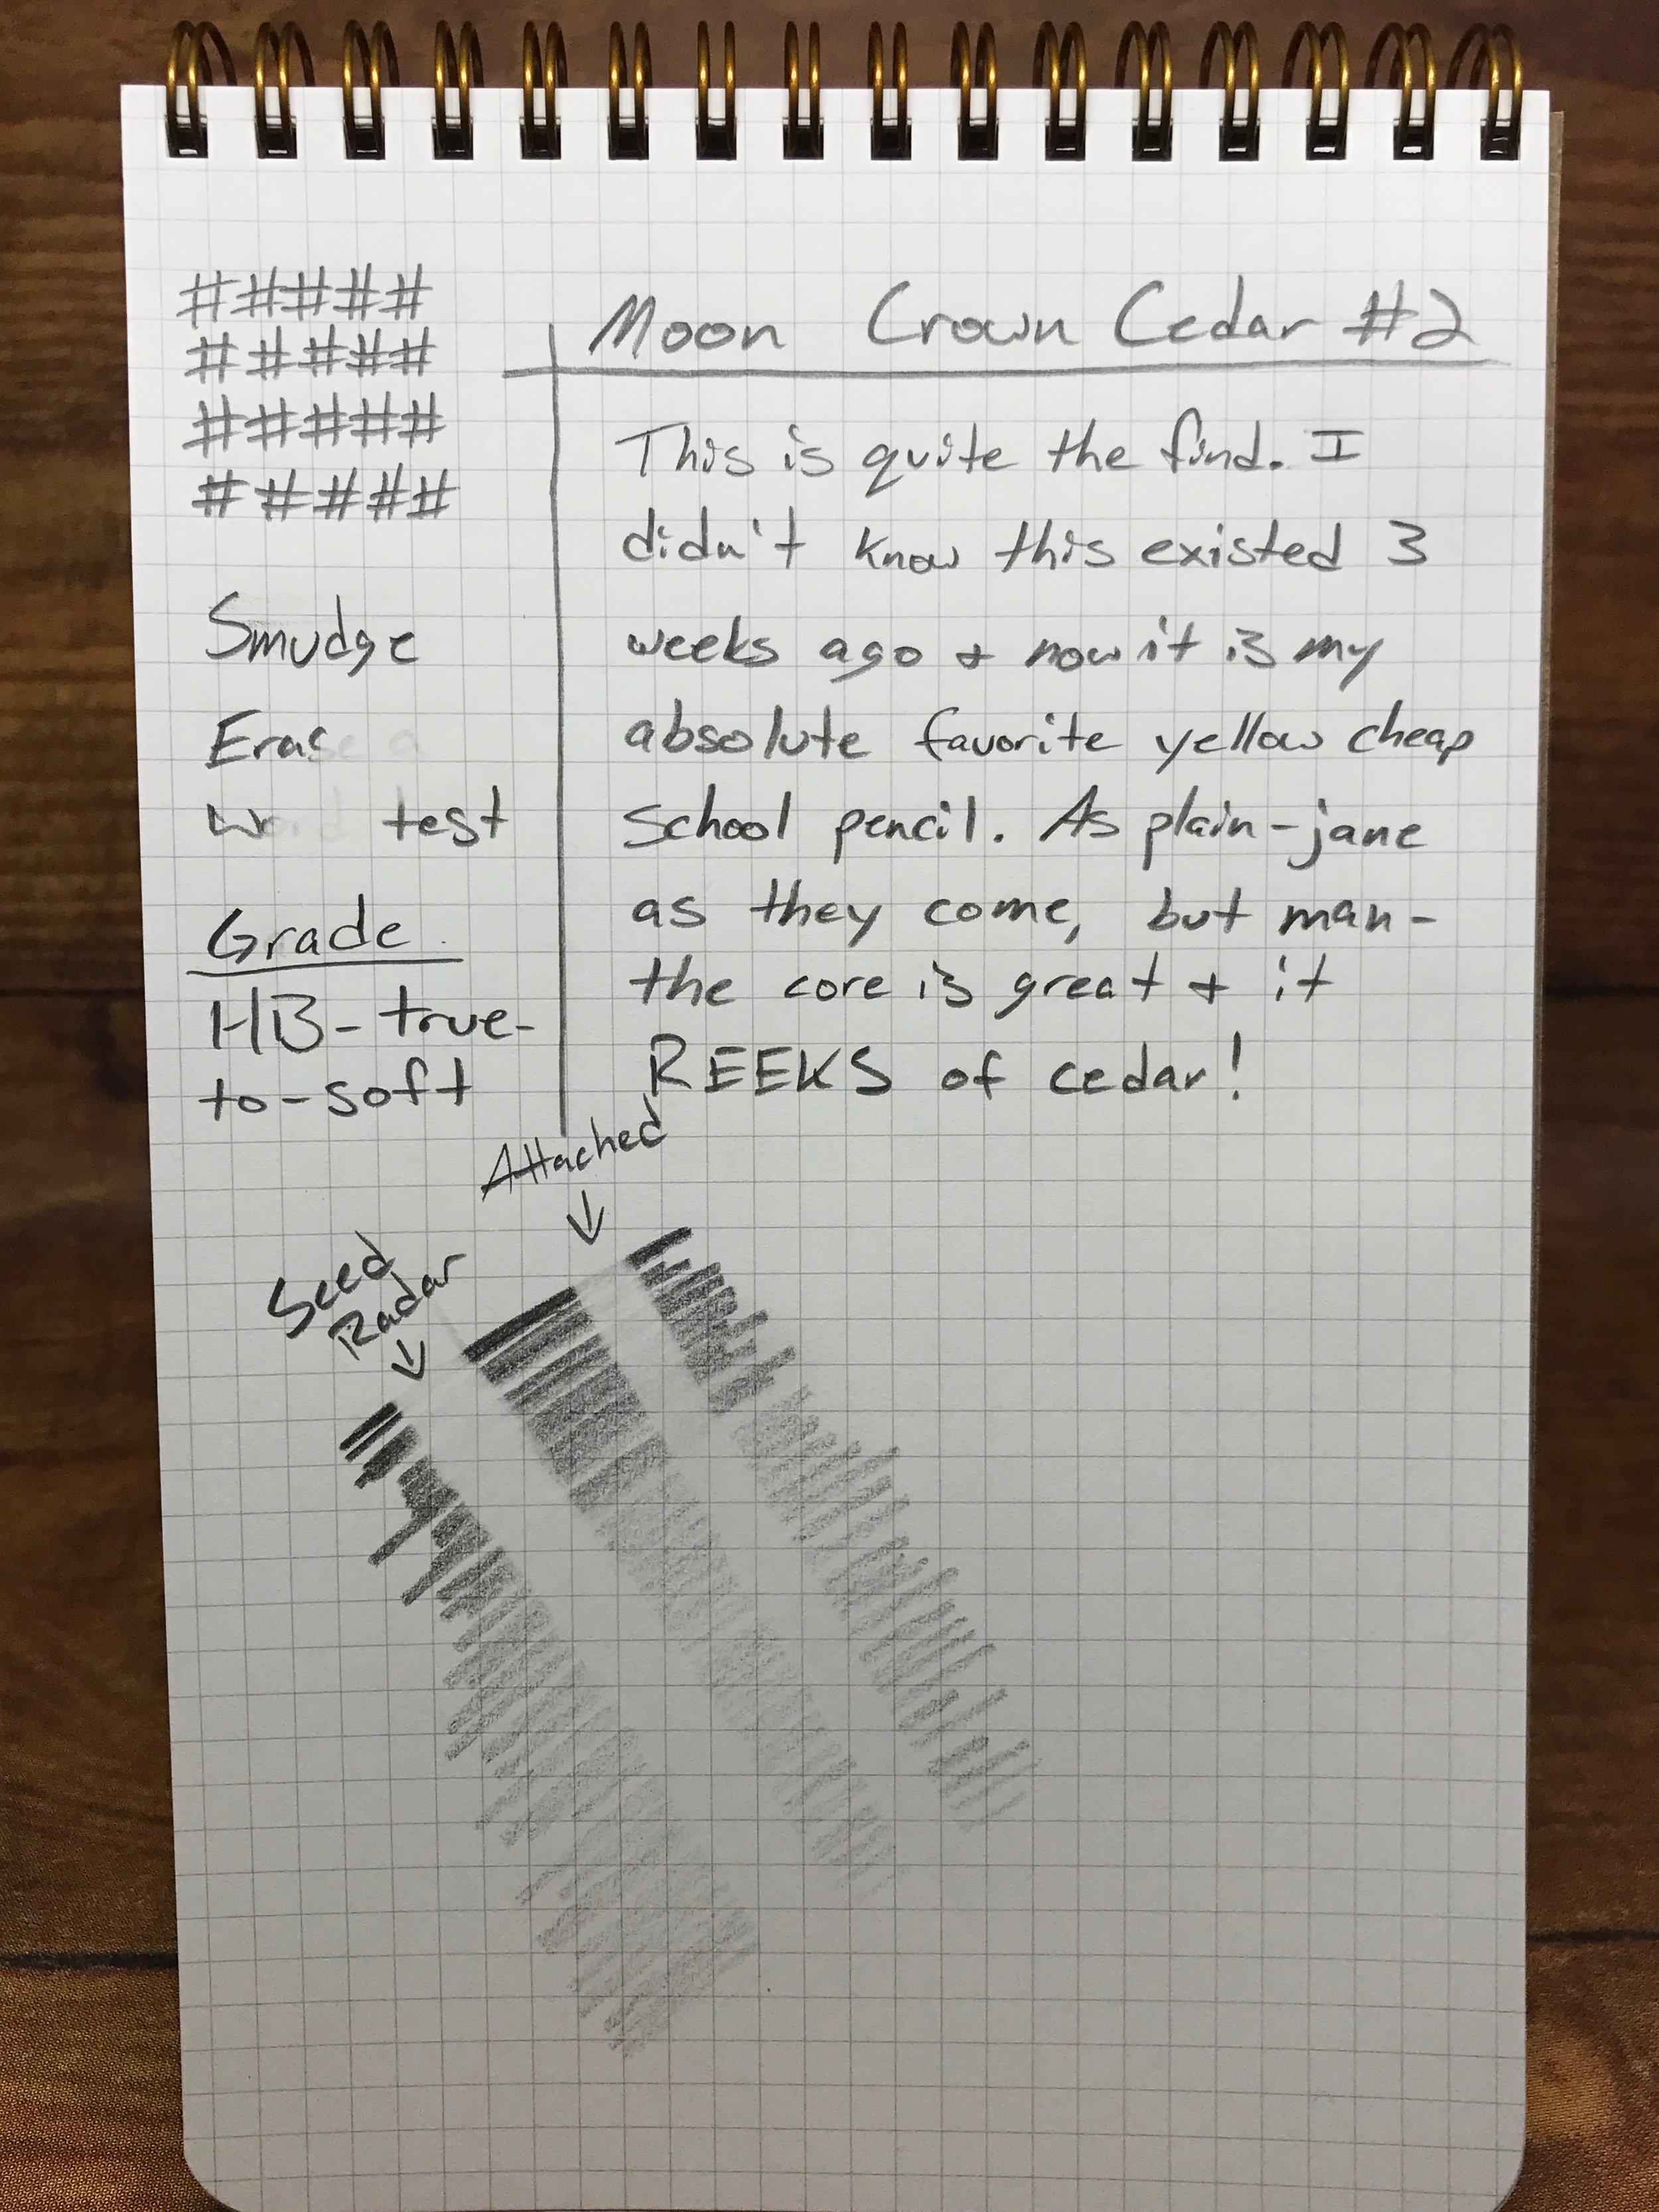 moon-products-crown-cedar-pencil-12.jpg